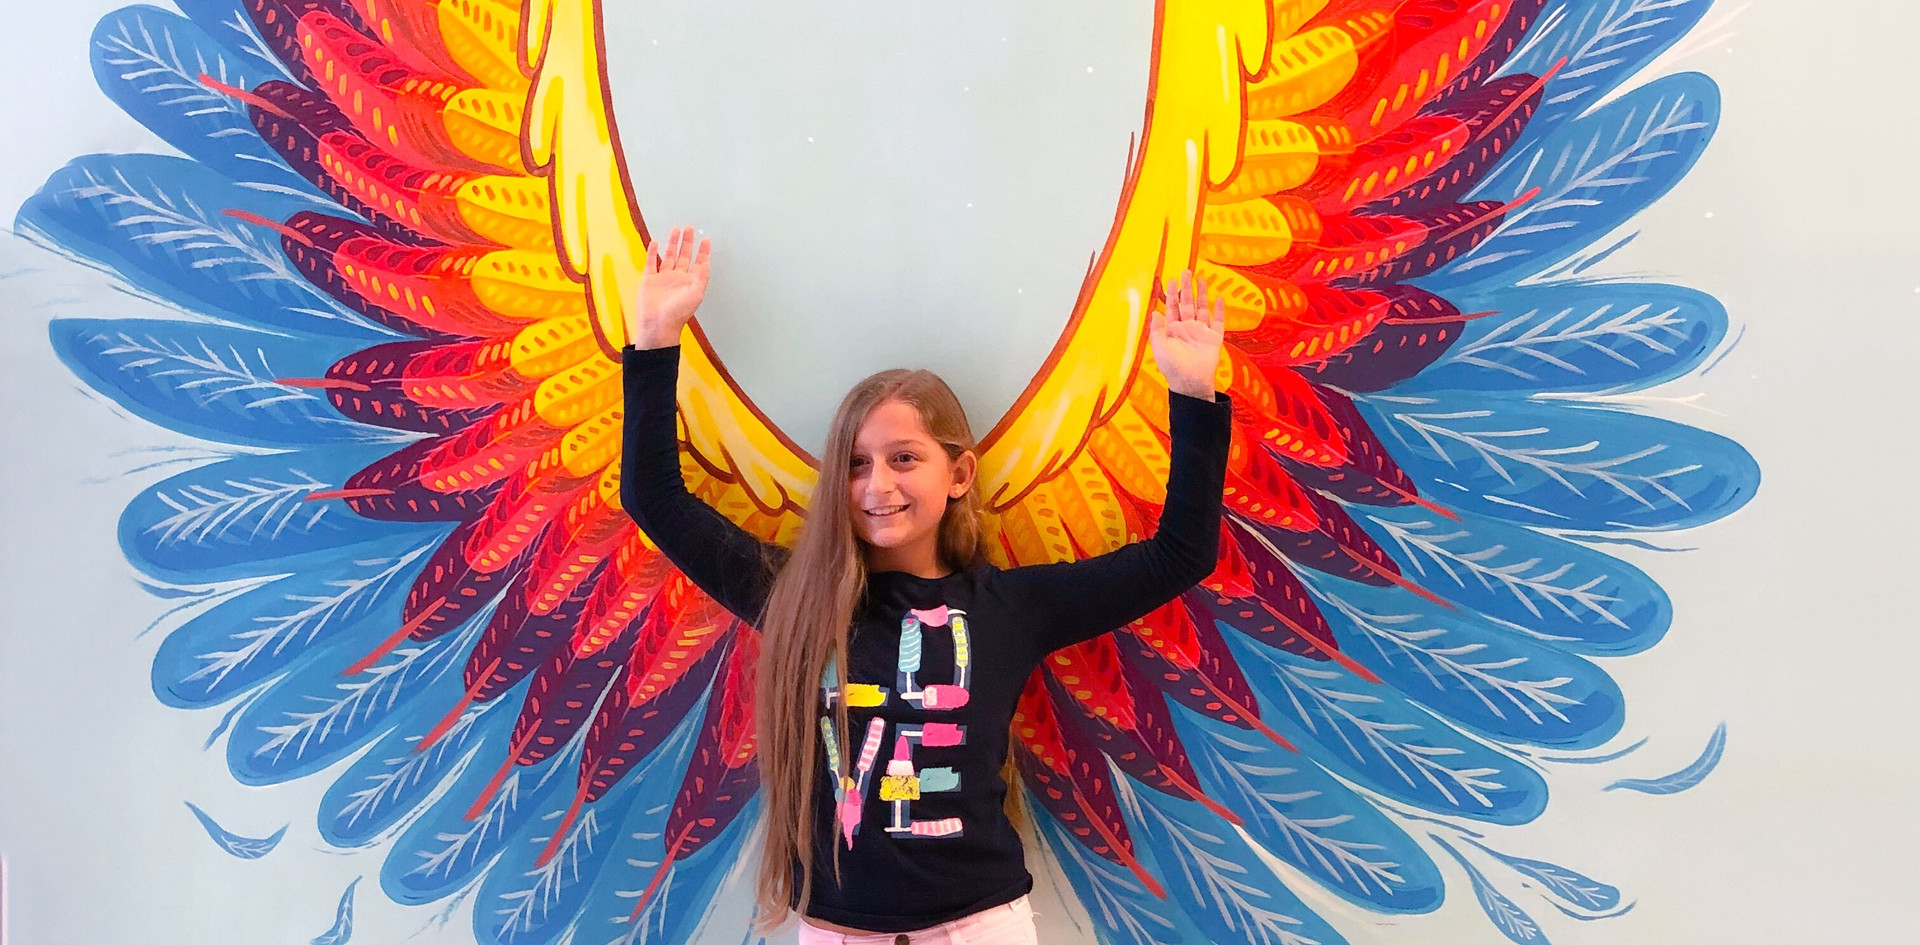 090719- Mia angel